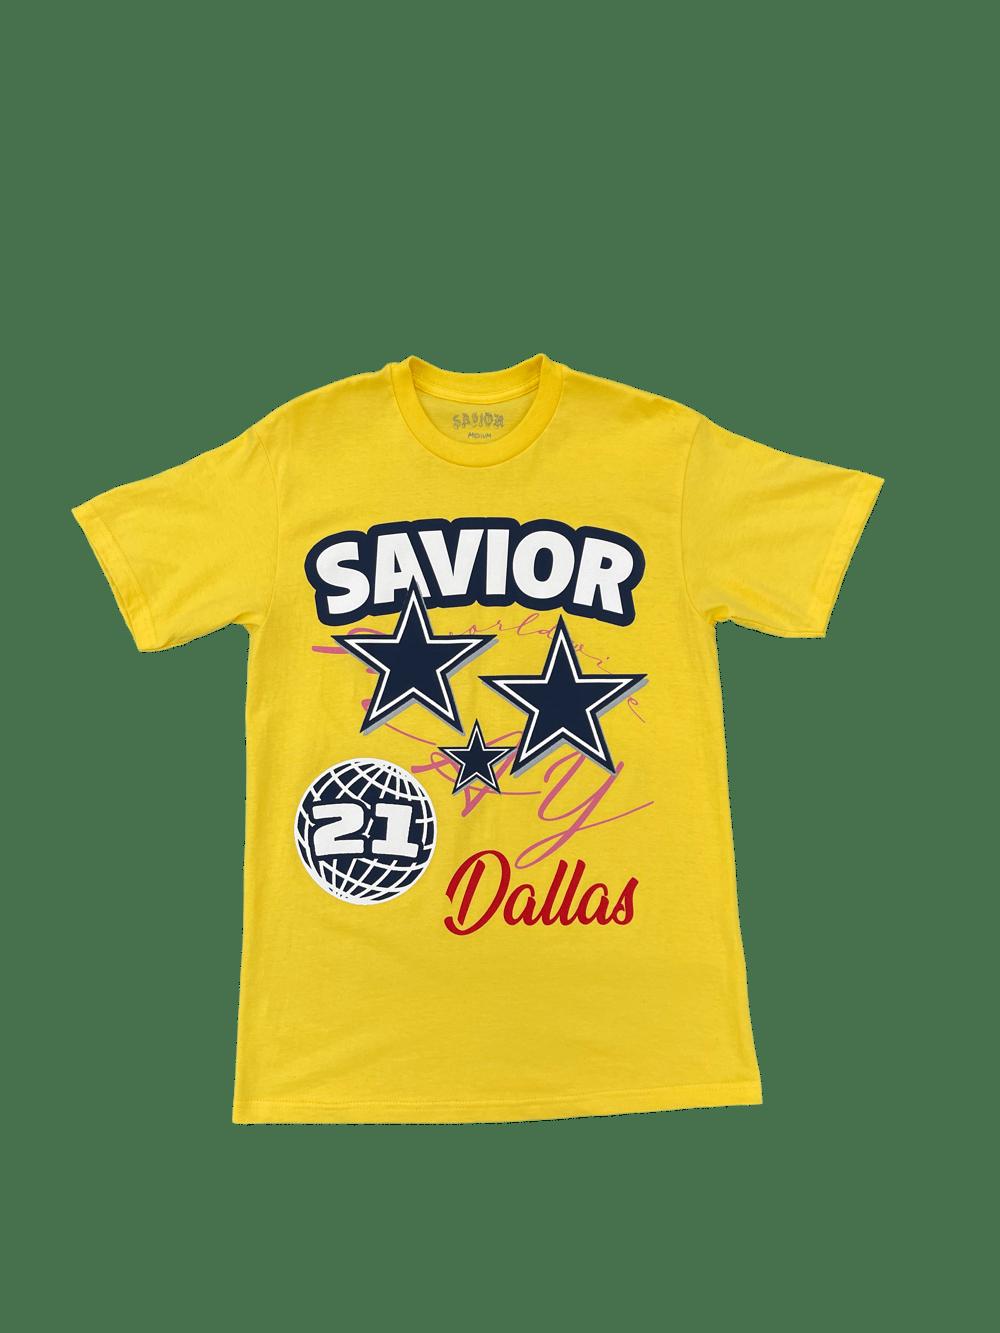 Image of Savior Worldwide Dallas Cowboy 21'